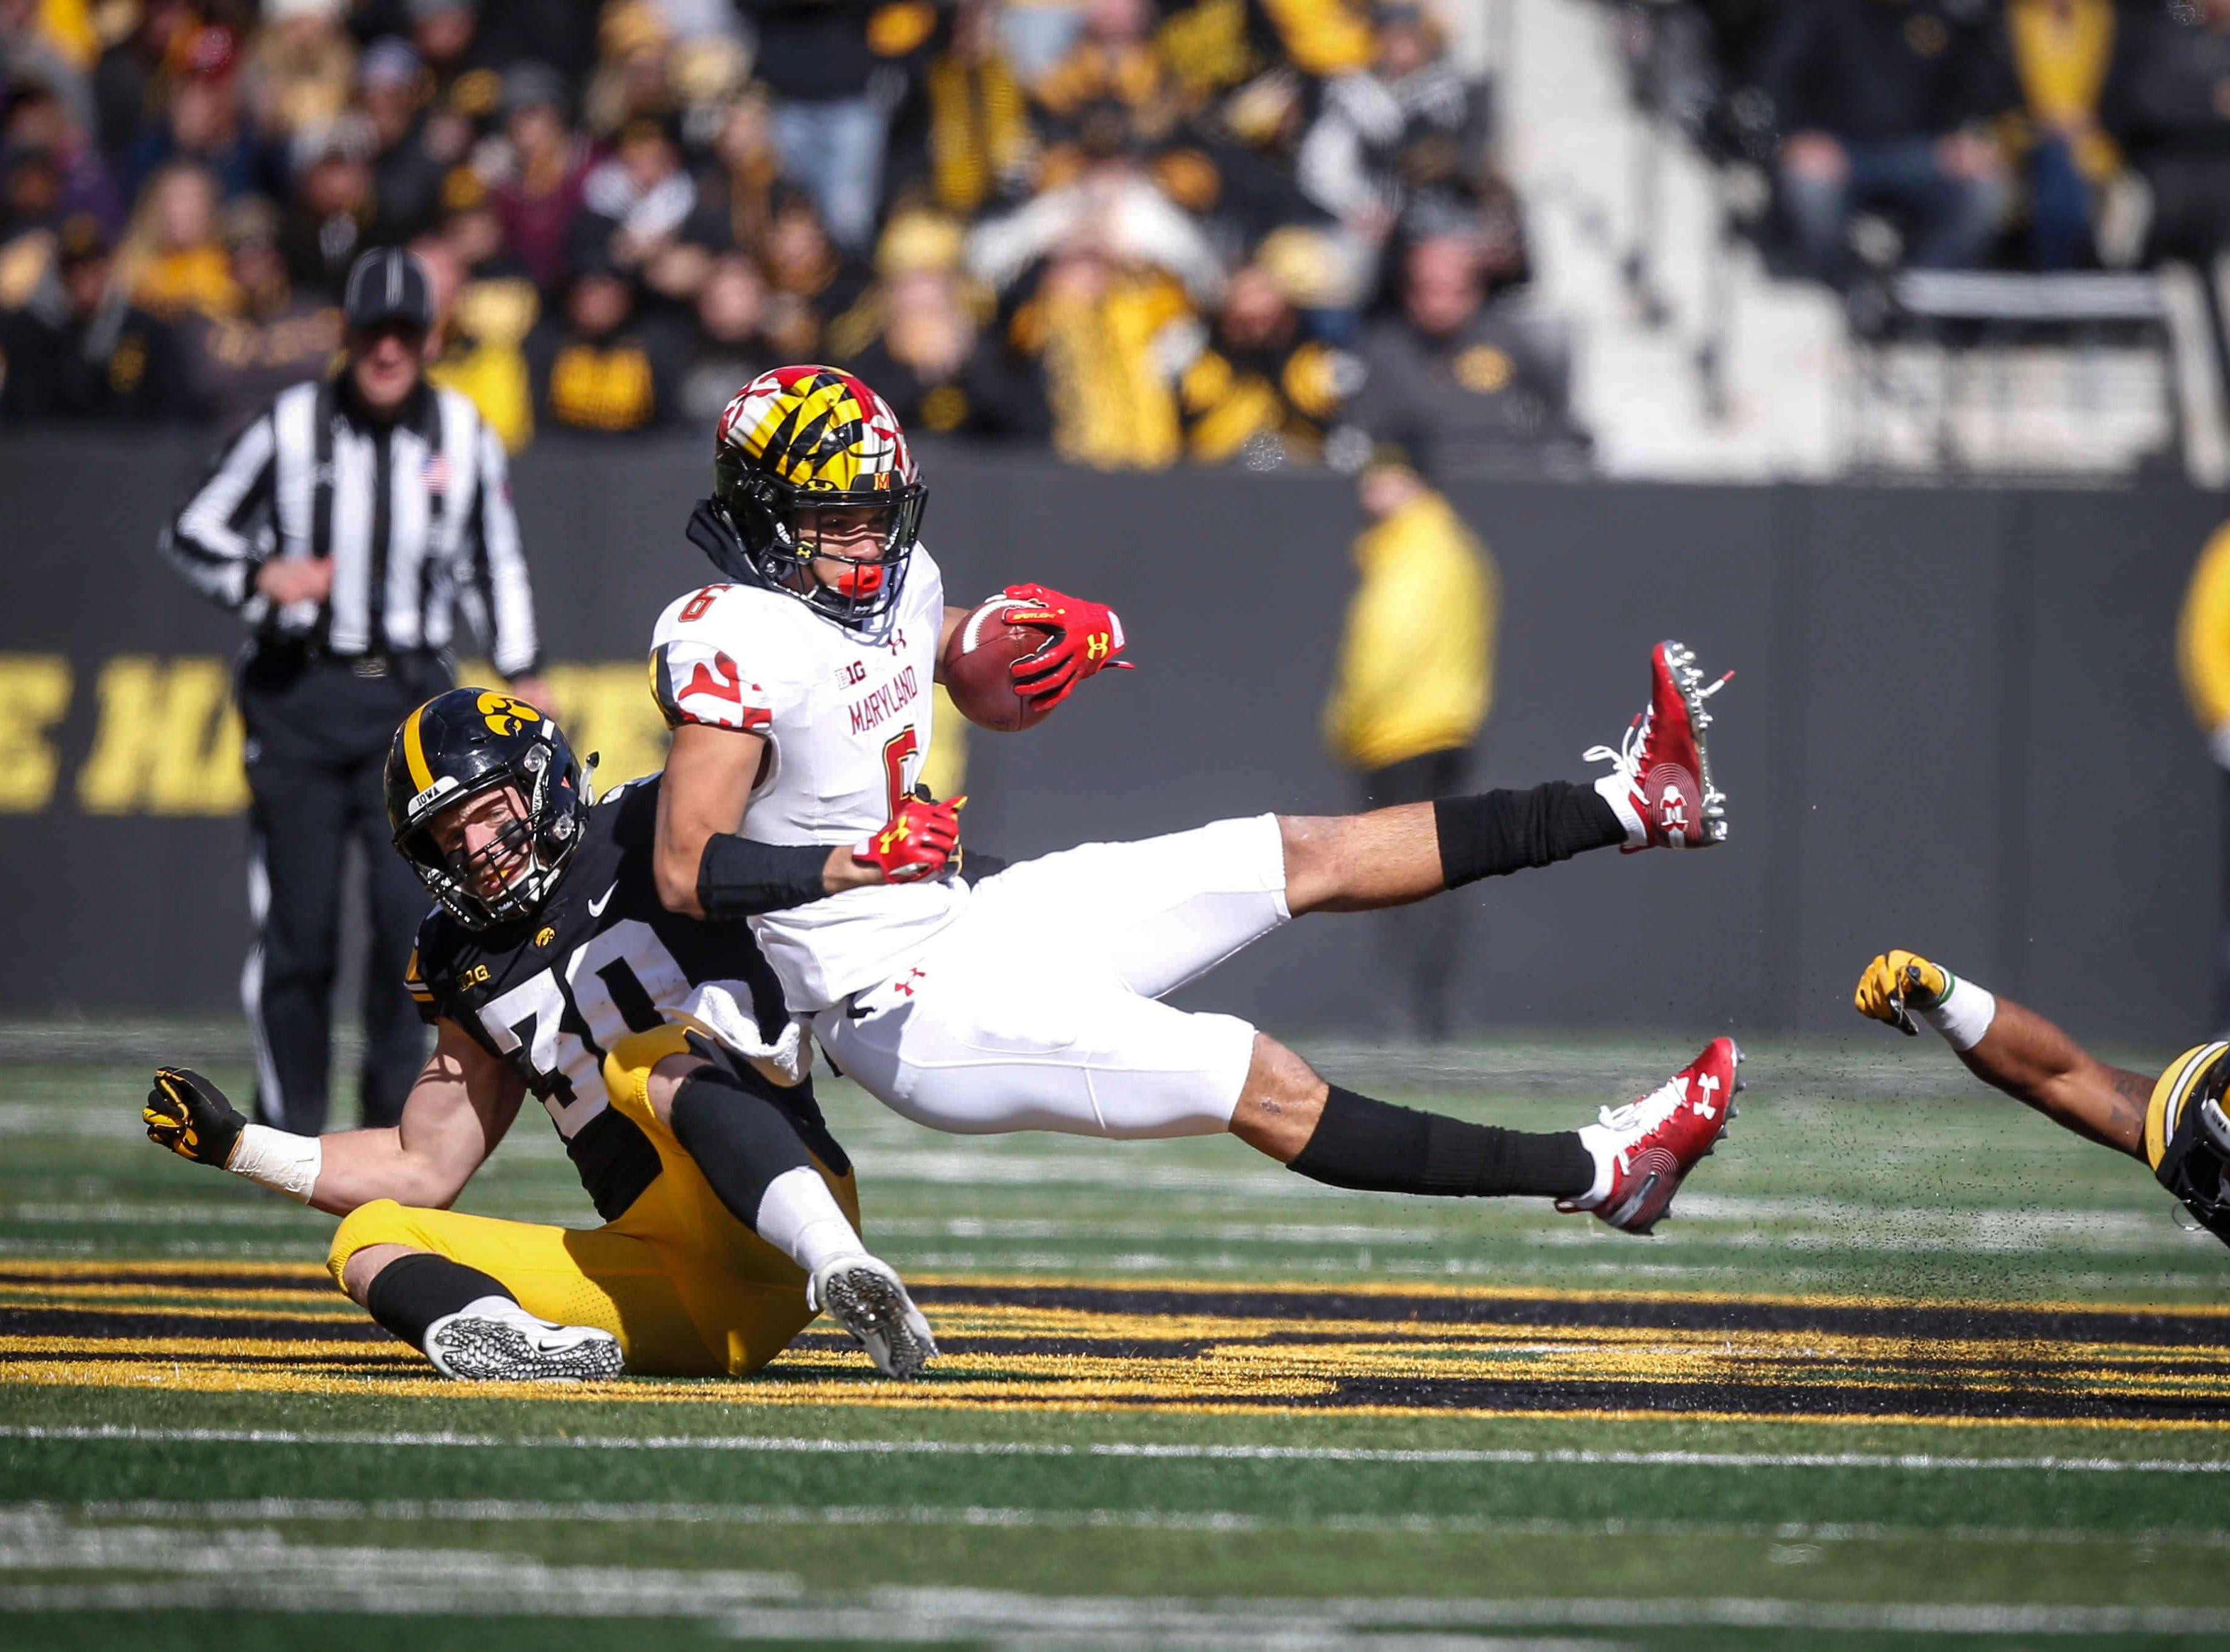 Iowa safety Jake Gervase pulls Maryland receiver Jeshaun Jones down in the third quarter on Saturday, Oct. 20, 2018, at Kinnick Stadium in Iowa City.